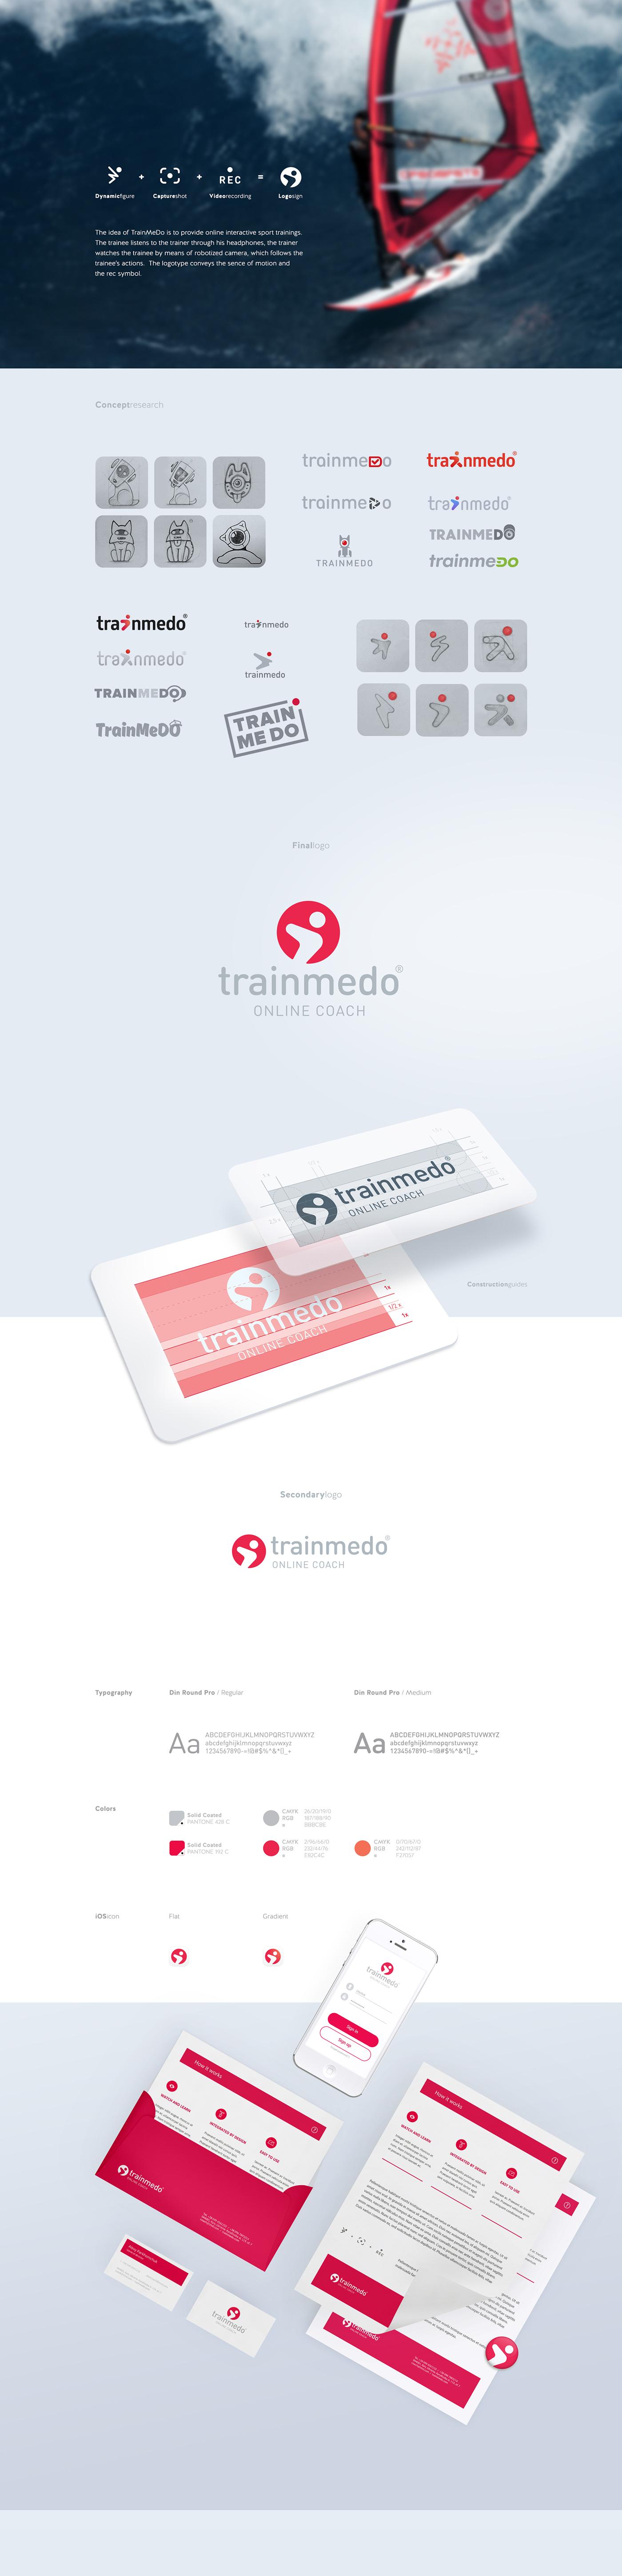 galitsky logo sport Corporate Identity video interactive training identity visual Logotype brand New brand